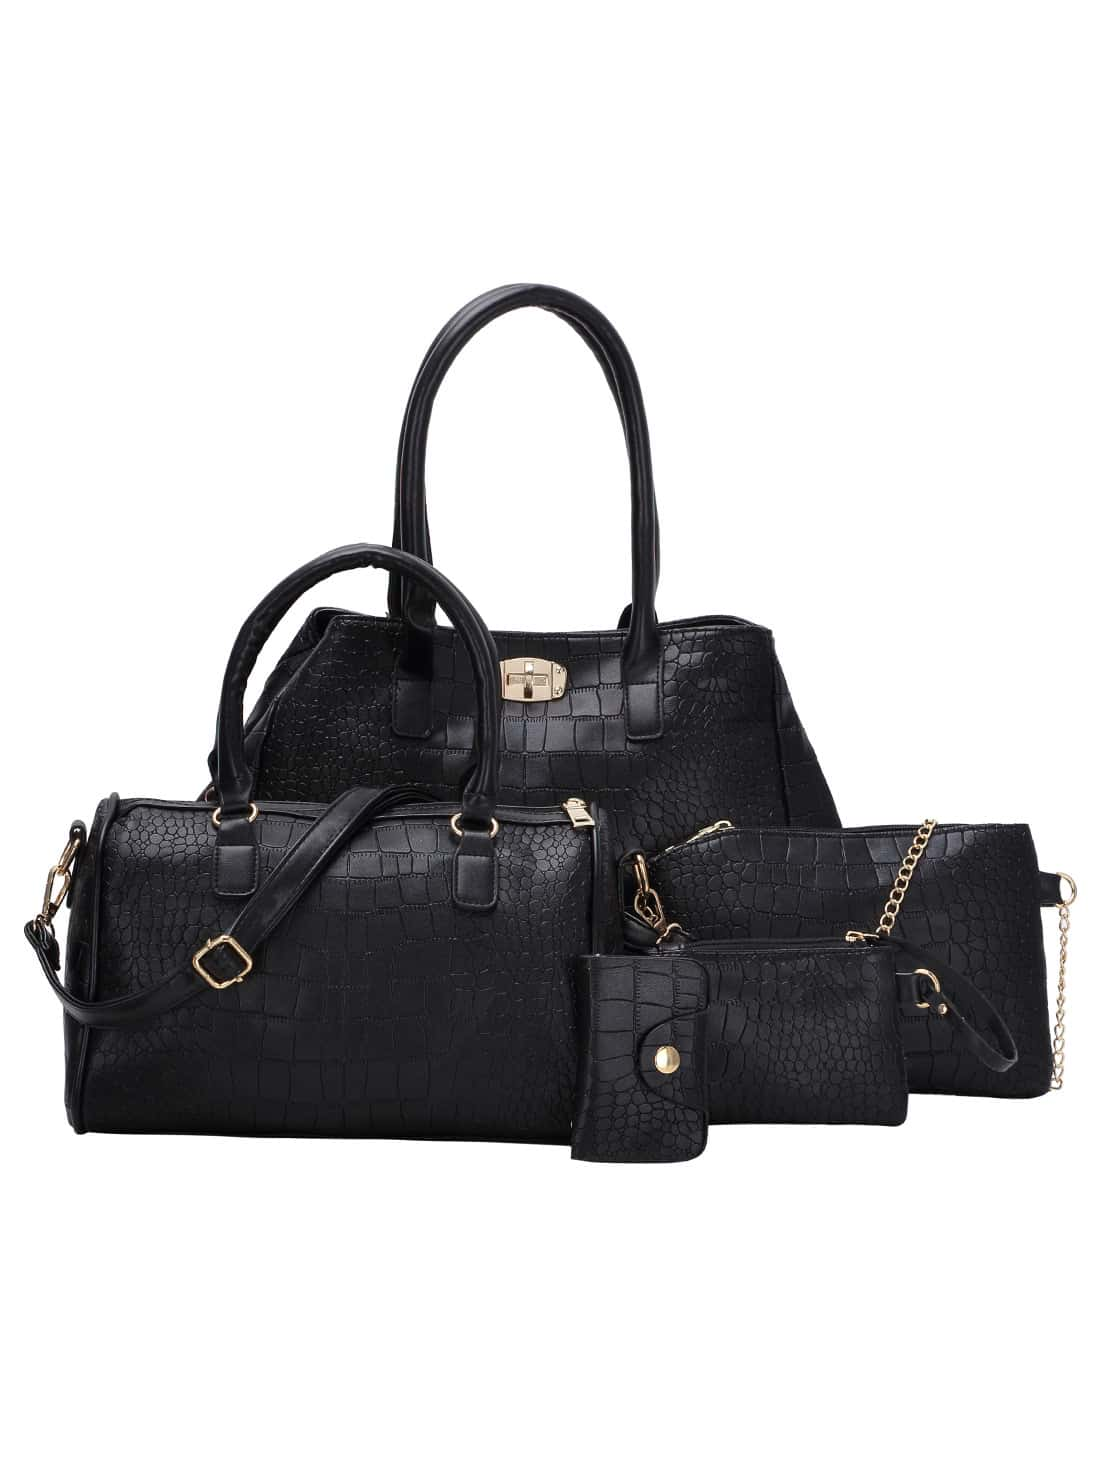 5pcs Faux Crocodile Embossed Leather Bag Set